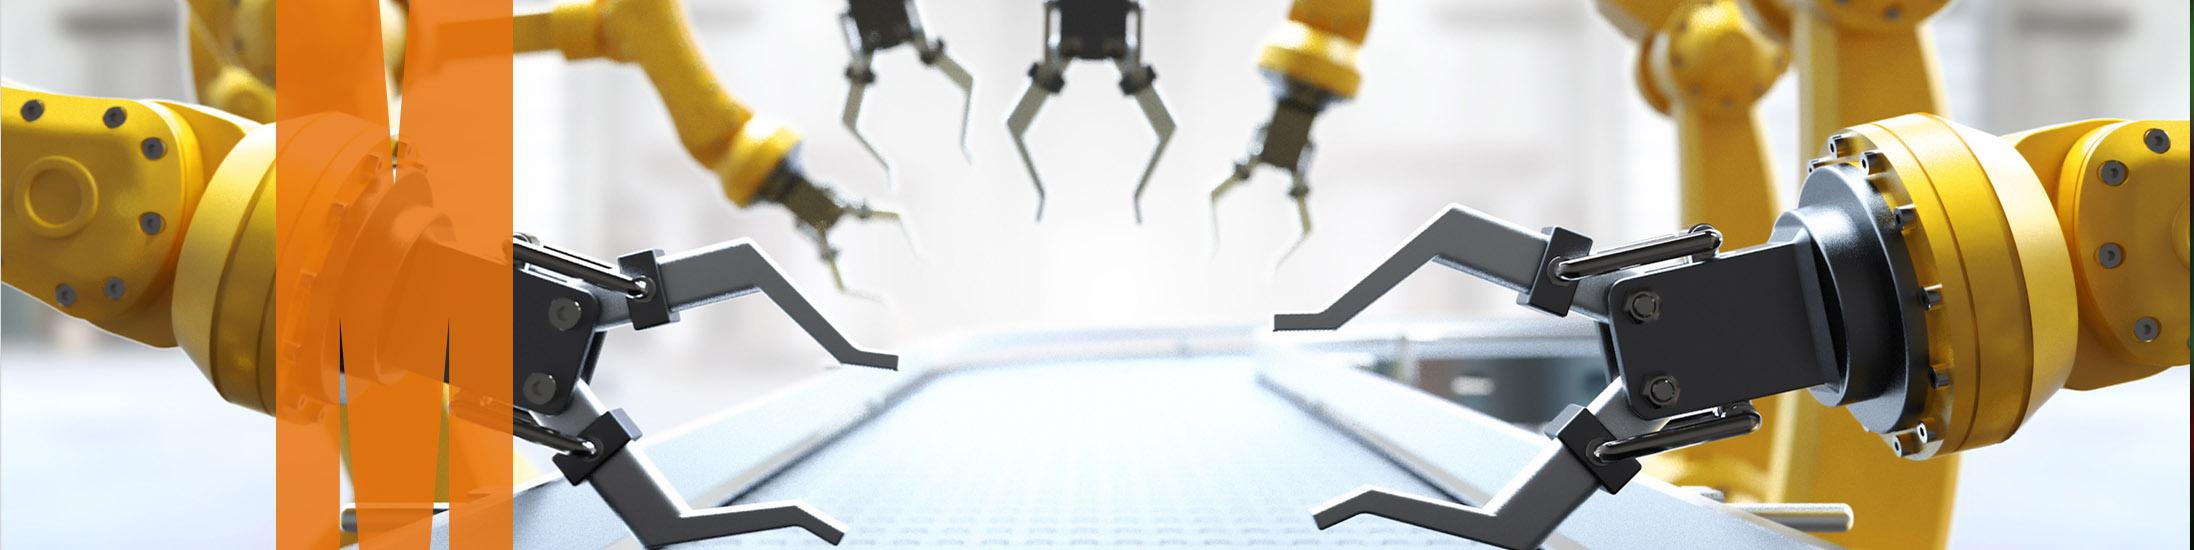 Will robots cost jobs?